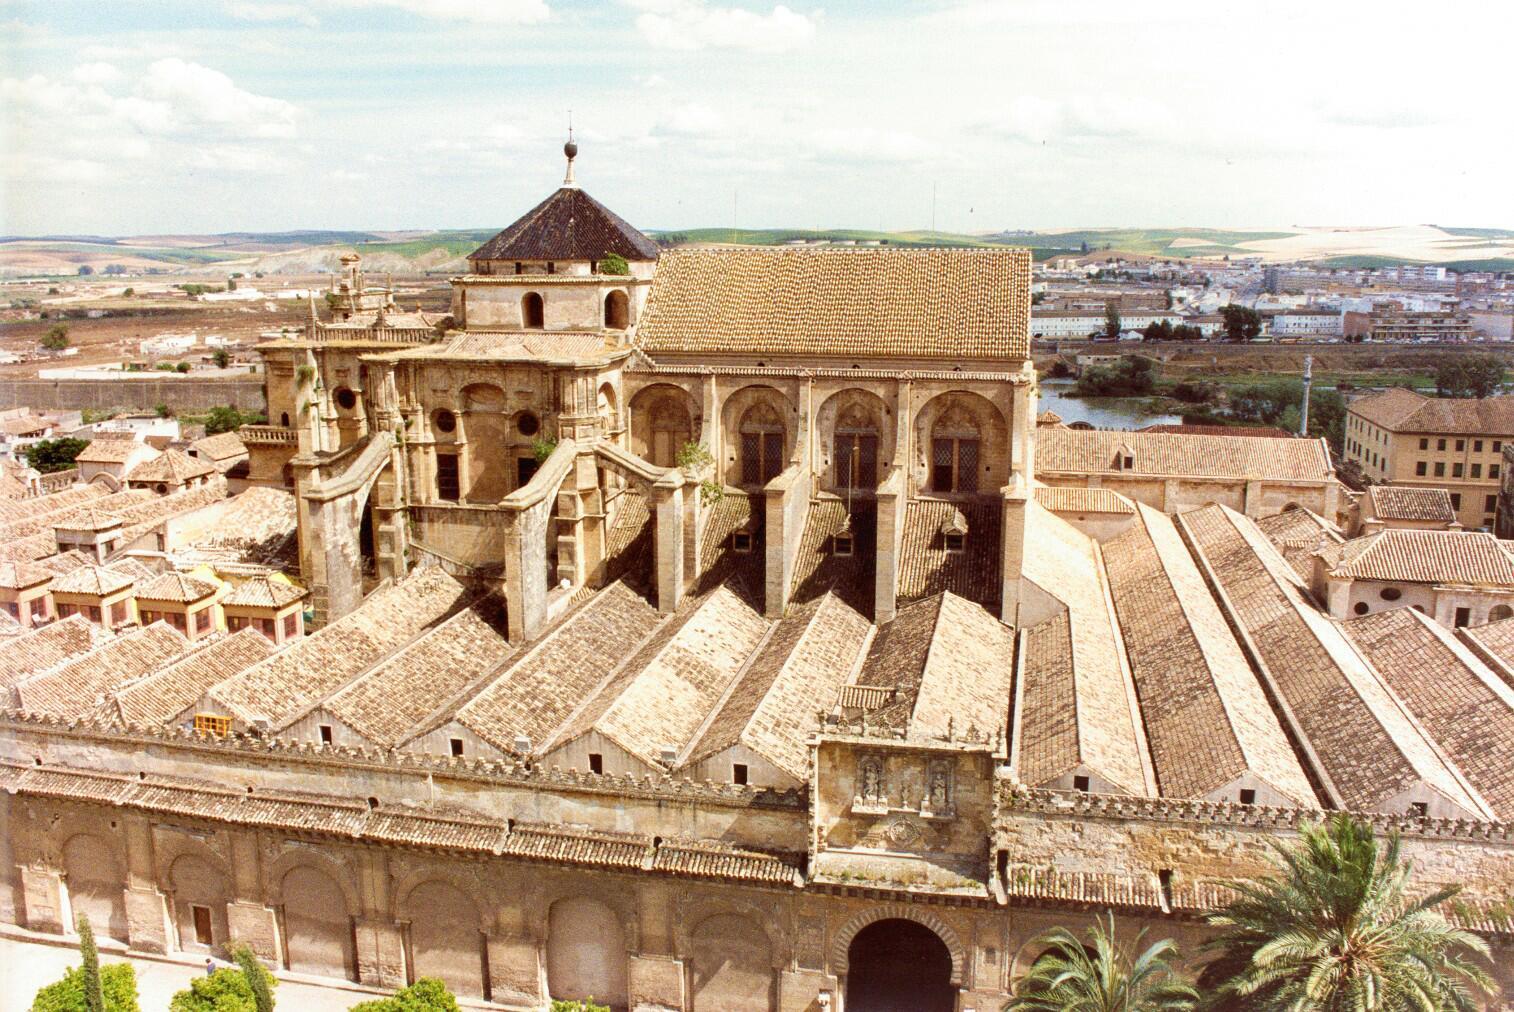 File:Mezquita de Córdoba - Techo.jpg - Wikimedia Commons